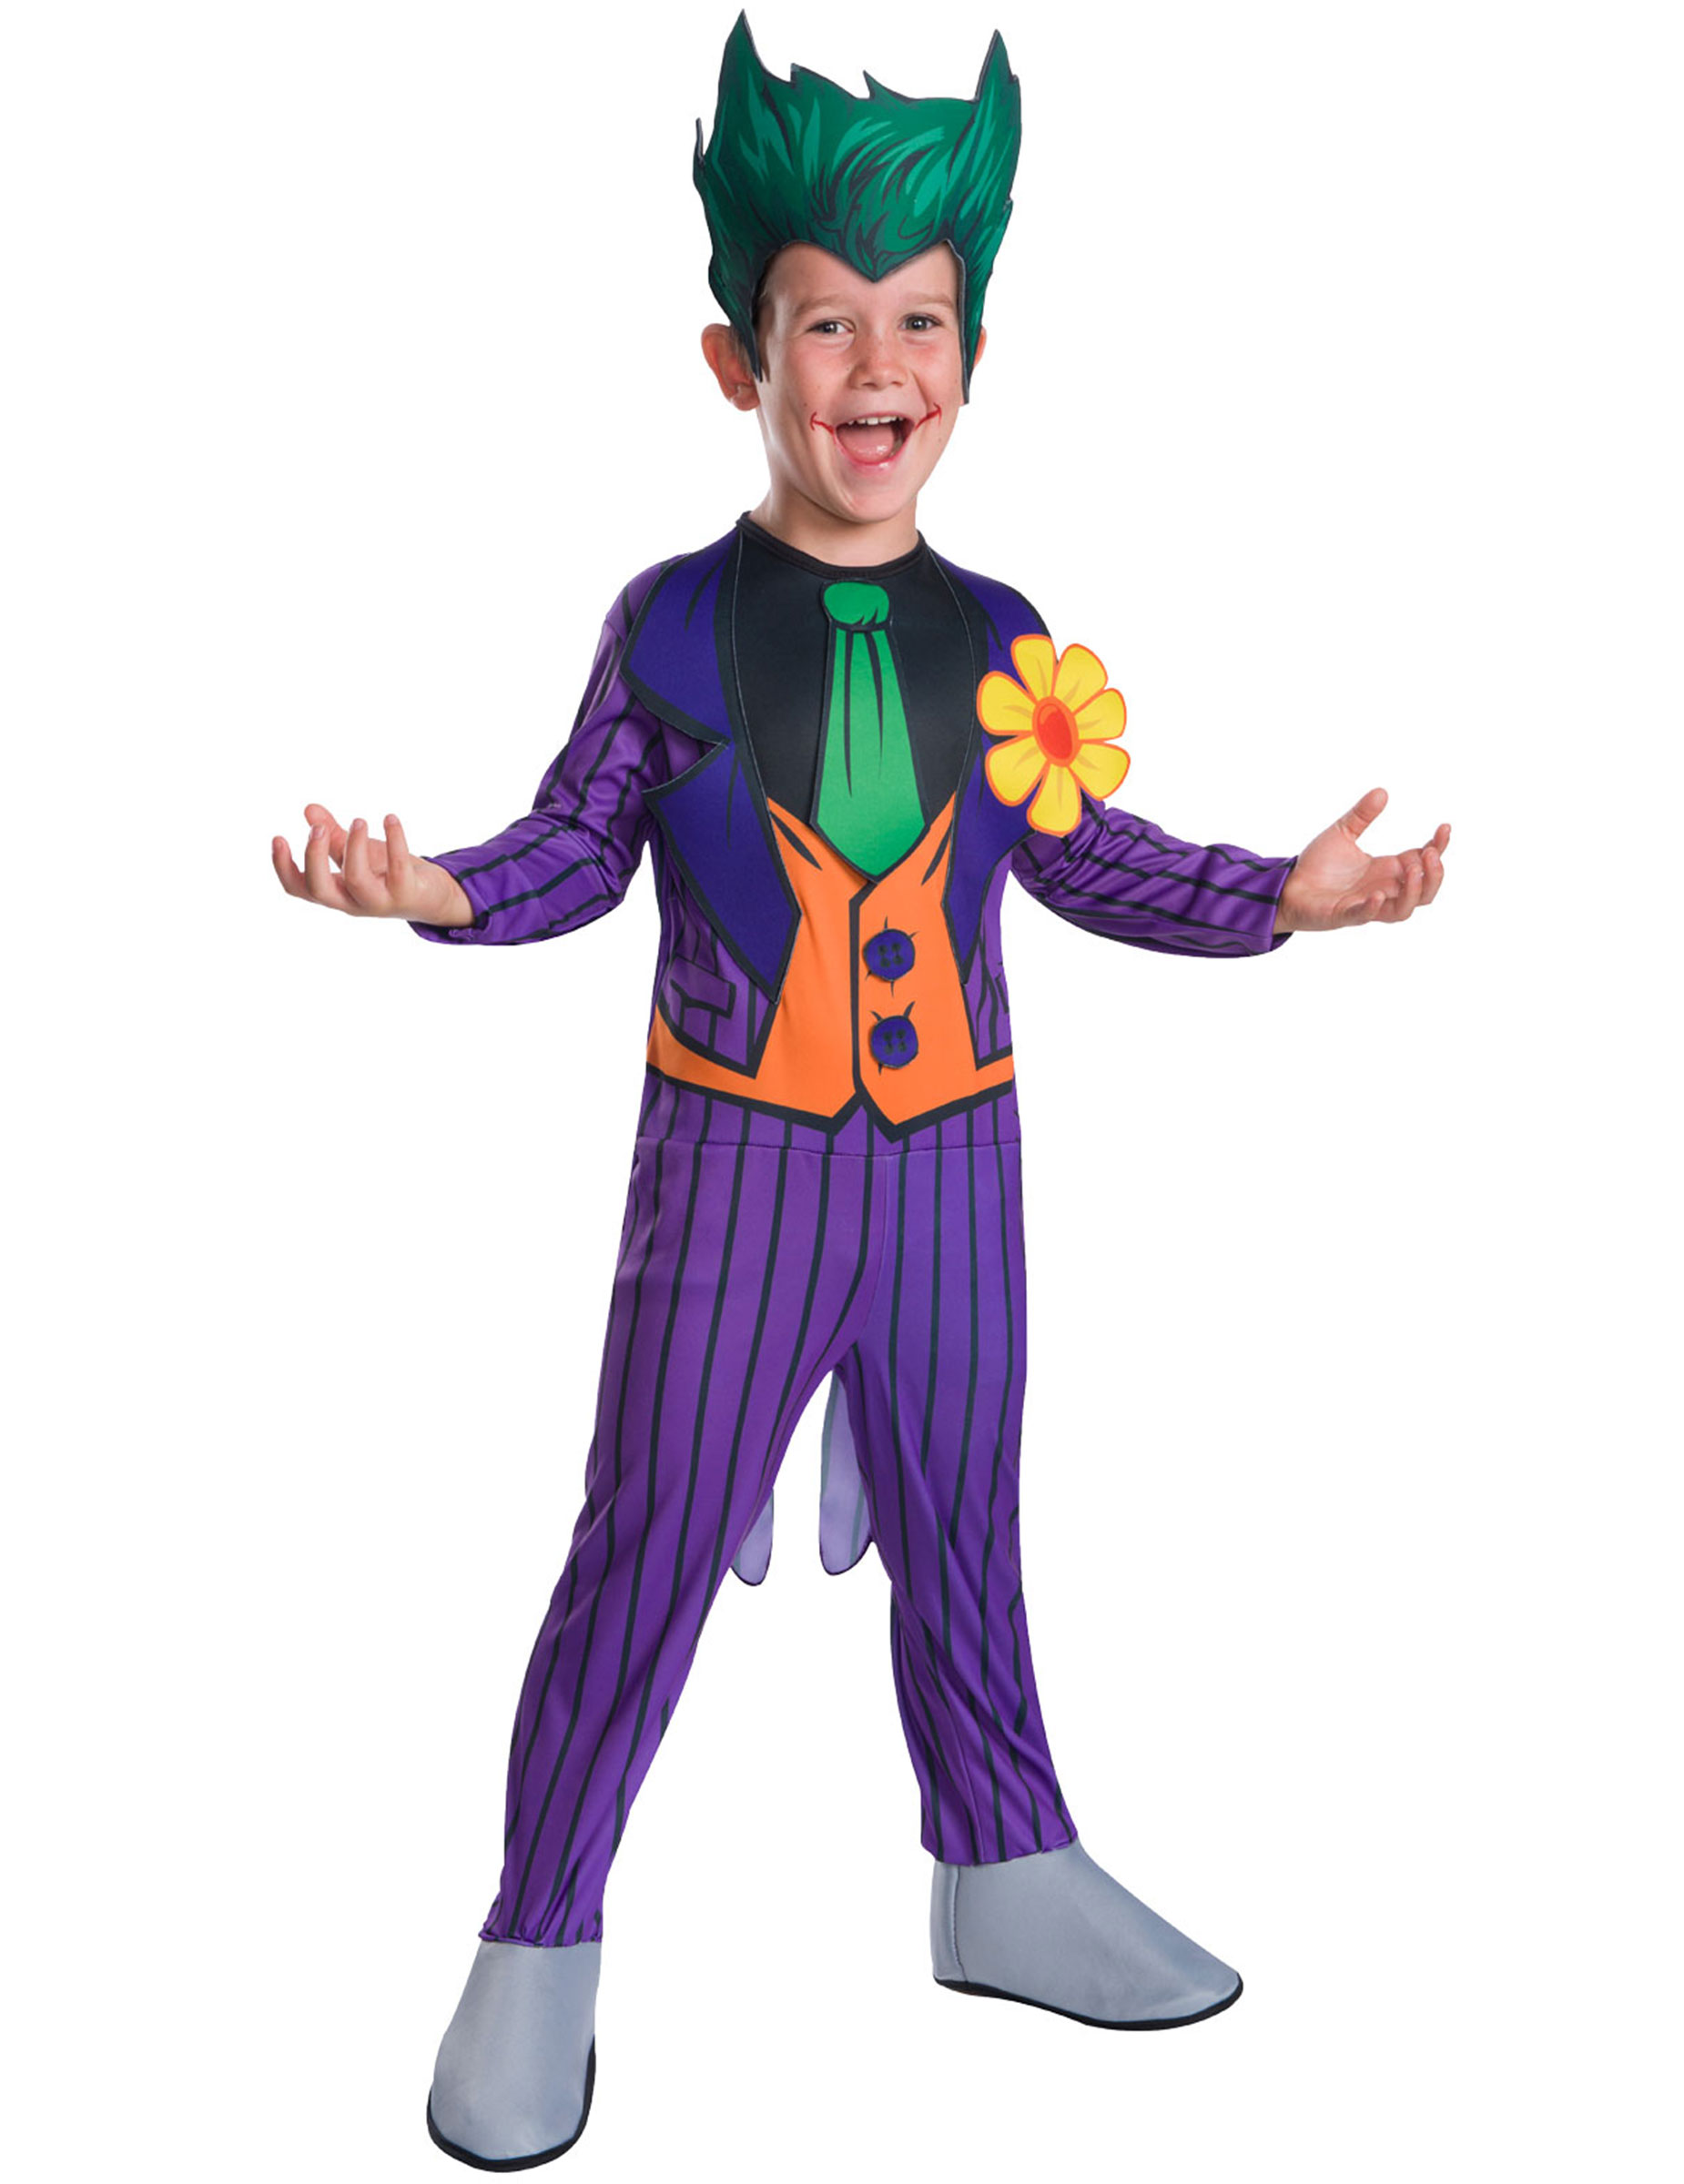 Joker Deluxeverkleidung Fur Kinder Fasching Violett Grun Gunstige